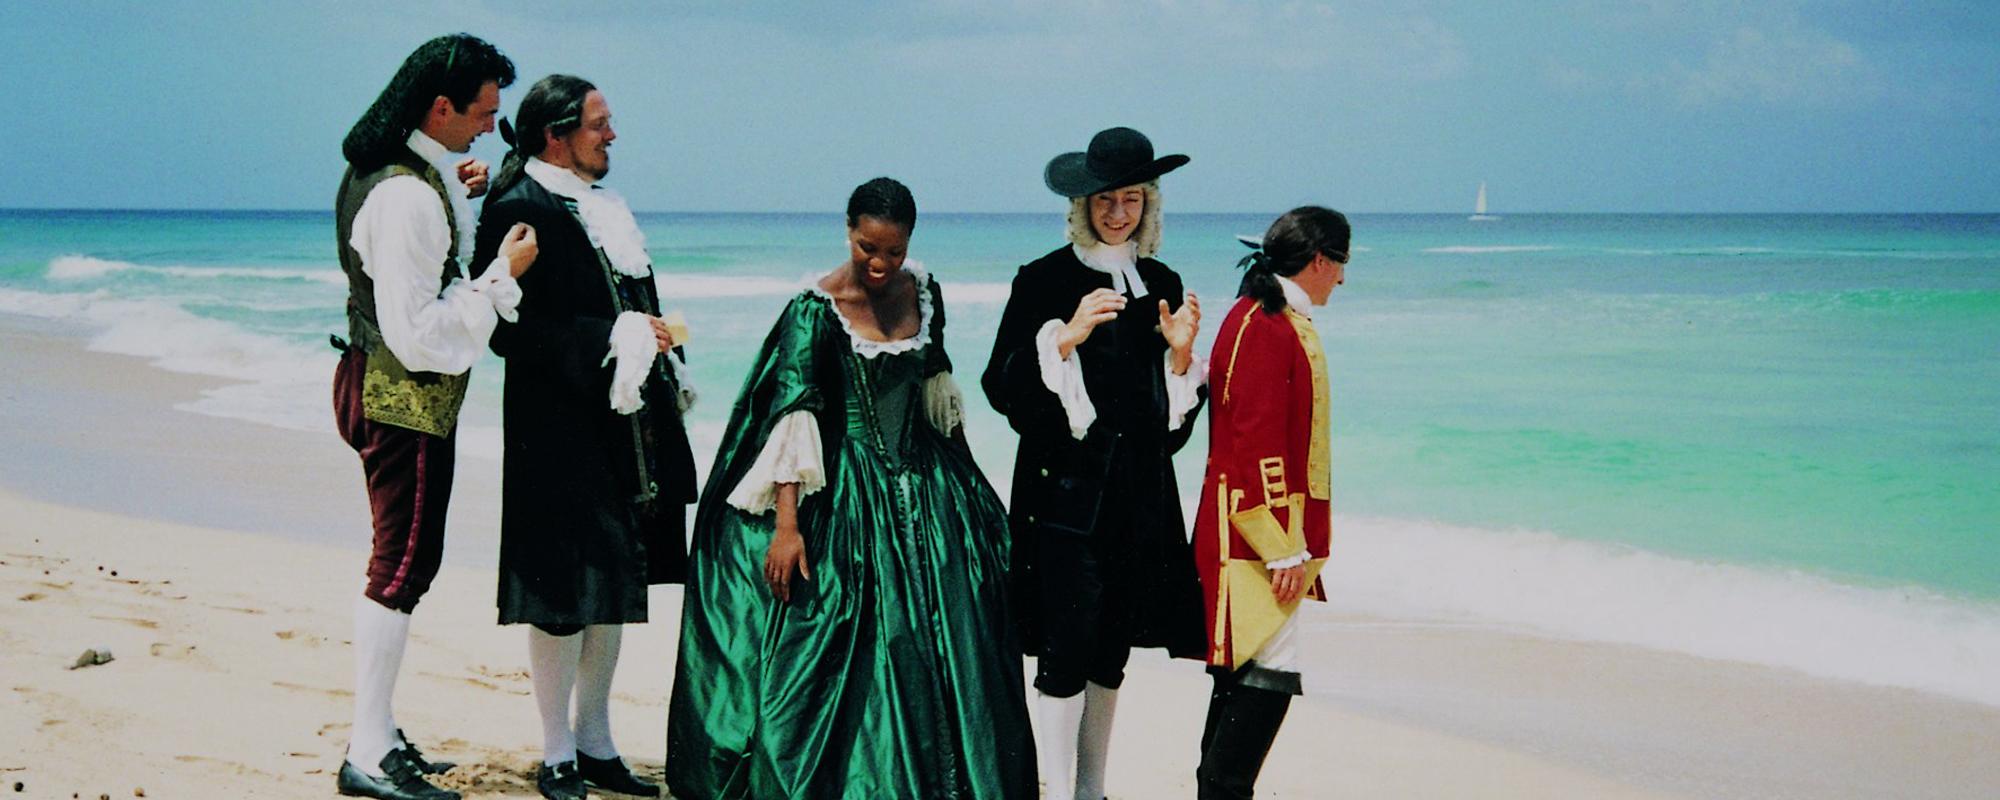 London Festival Opera singers in Barbados